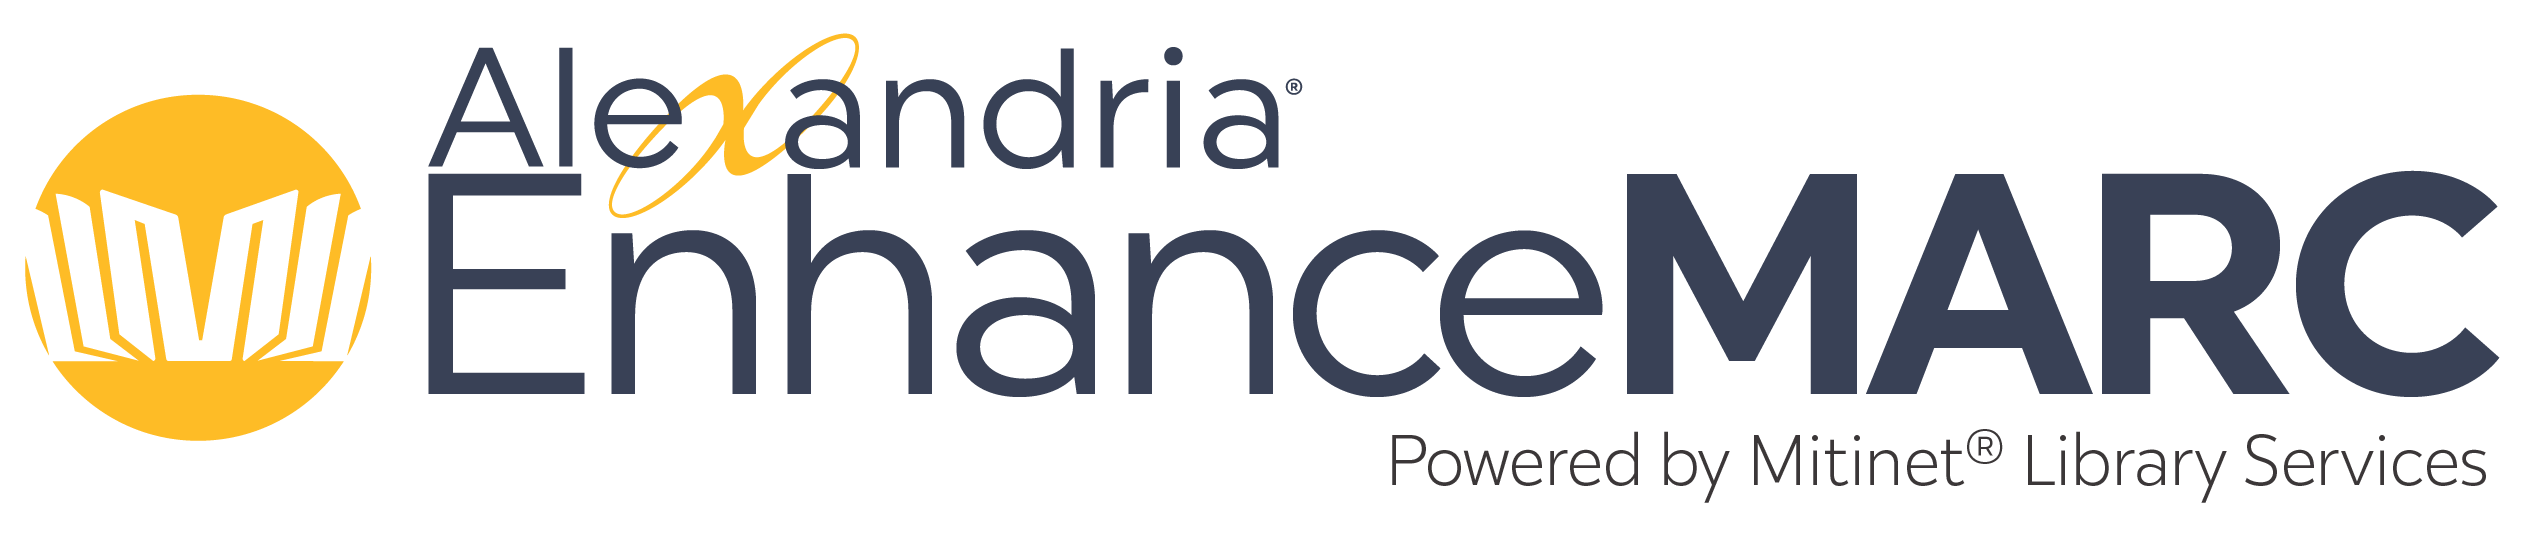 EnhanceMARC-logo